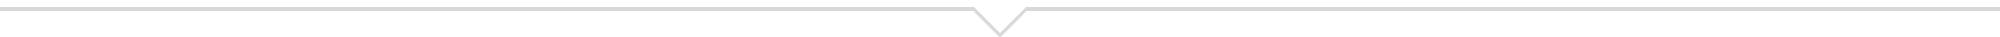 Corso Interaziendale SAP BusinessObjects Web Intelligence 4.1: Report design – Corso base - A.D. Global Solution